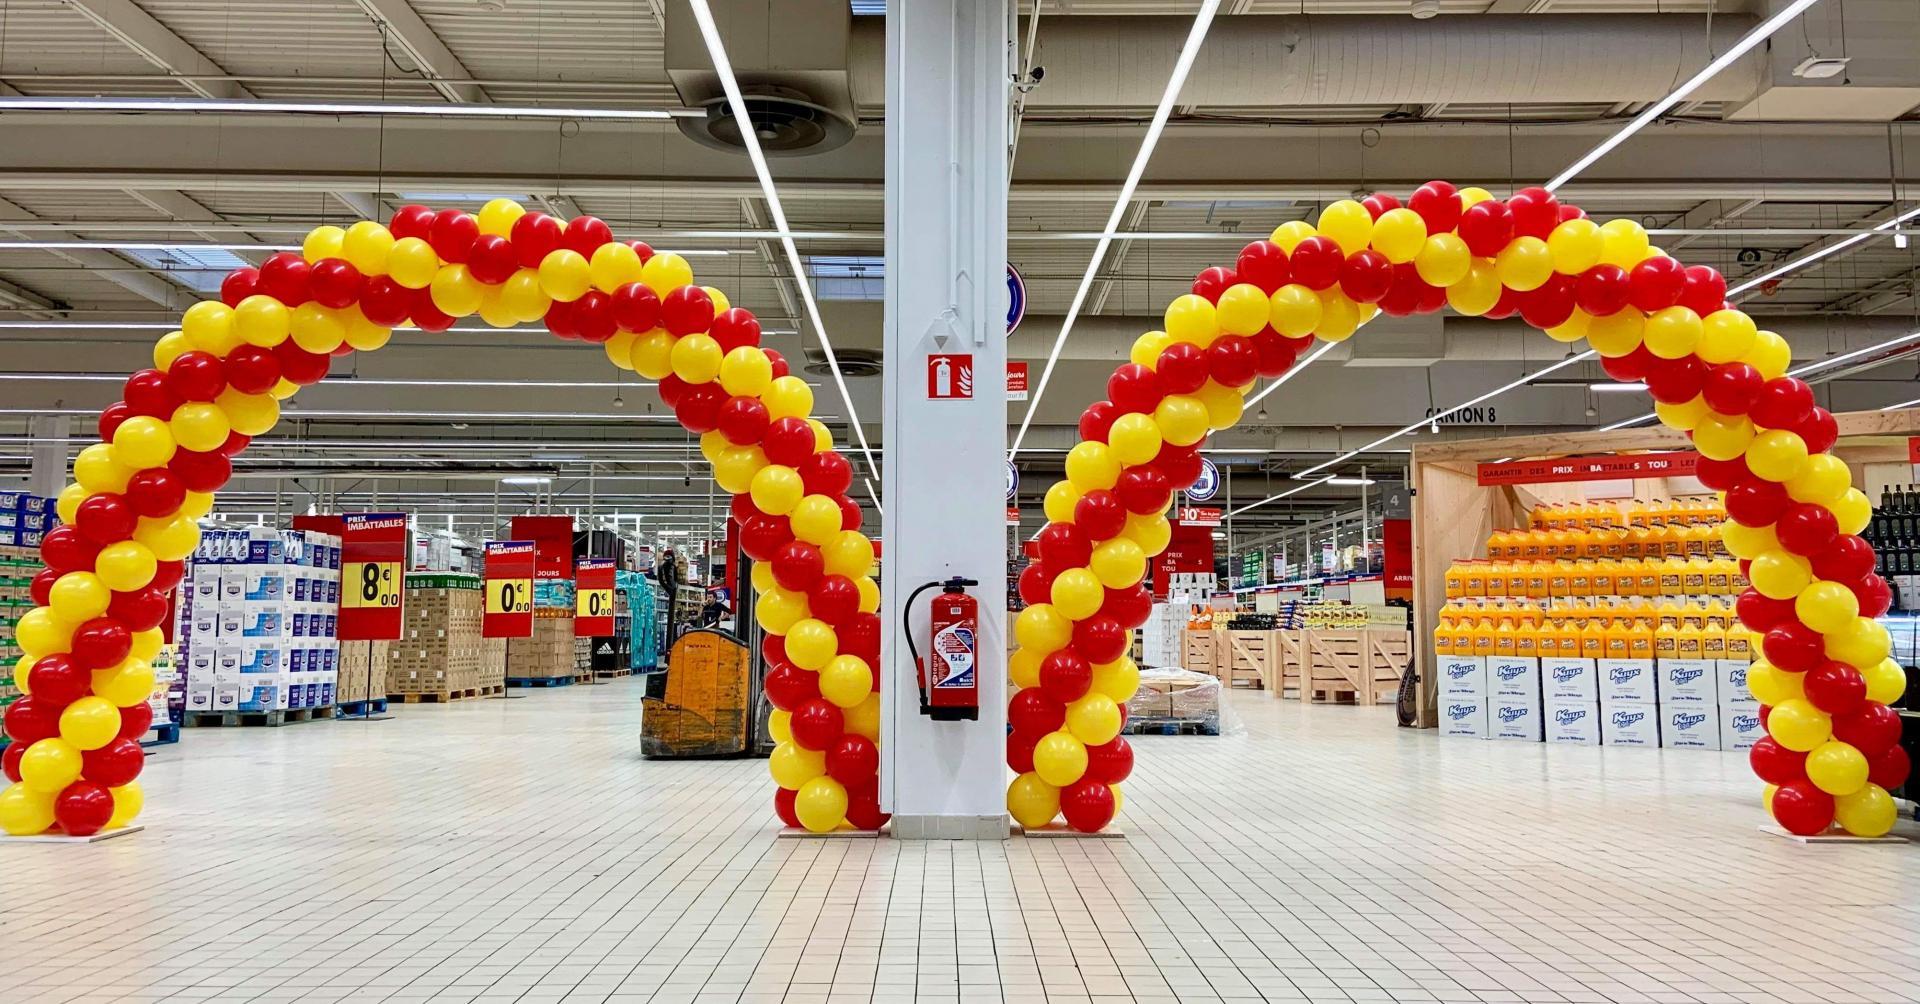 Arche entrée magasin inauguration